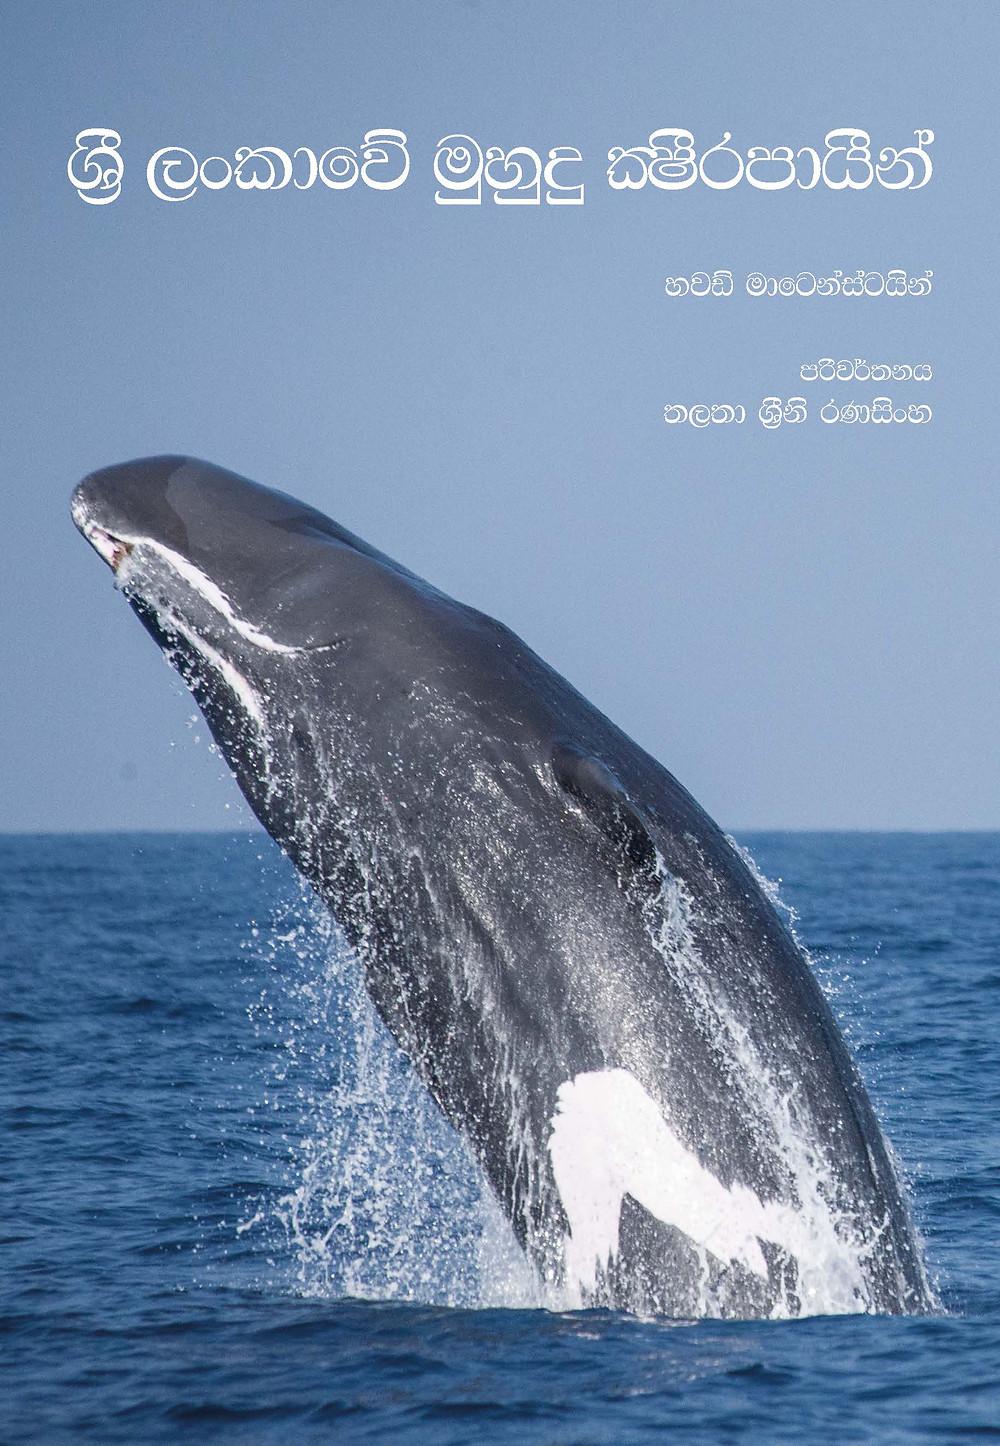 Sri Lanka Marine Mammal Research & Conservation, Technical Report